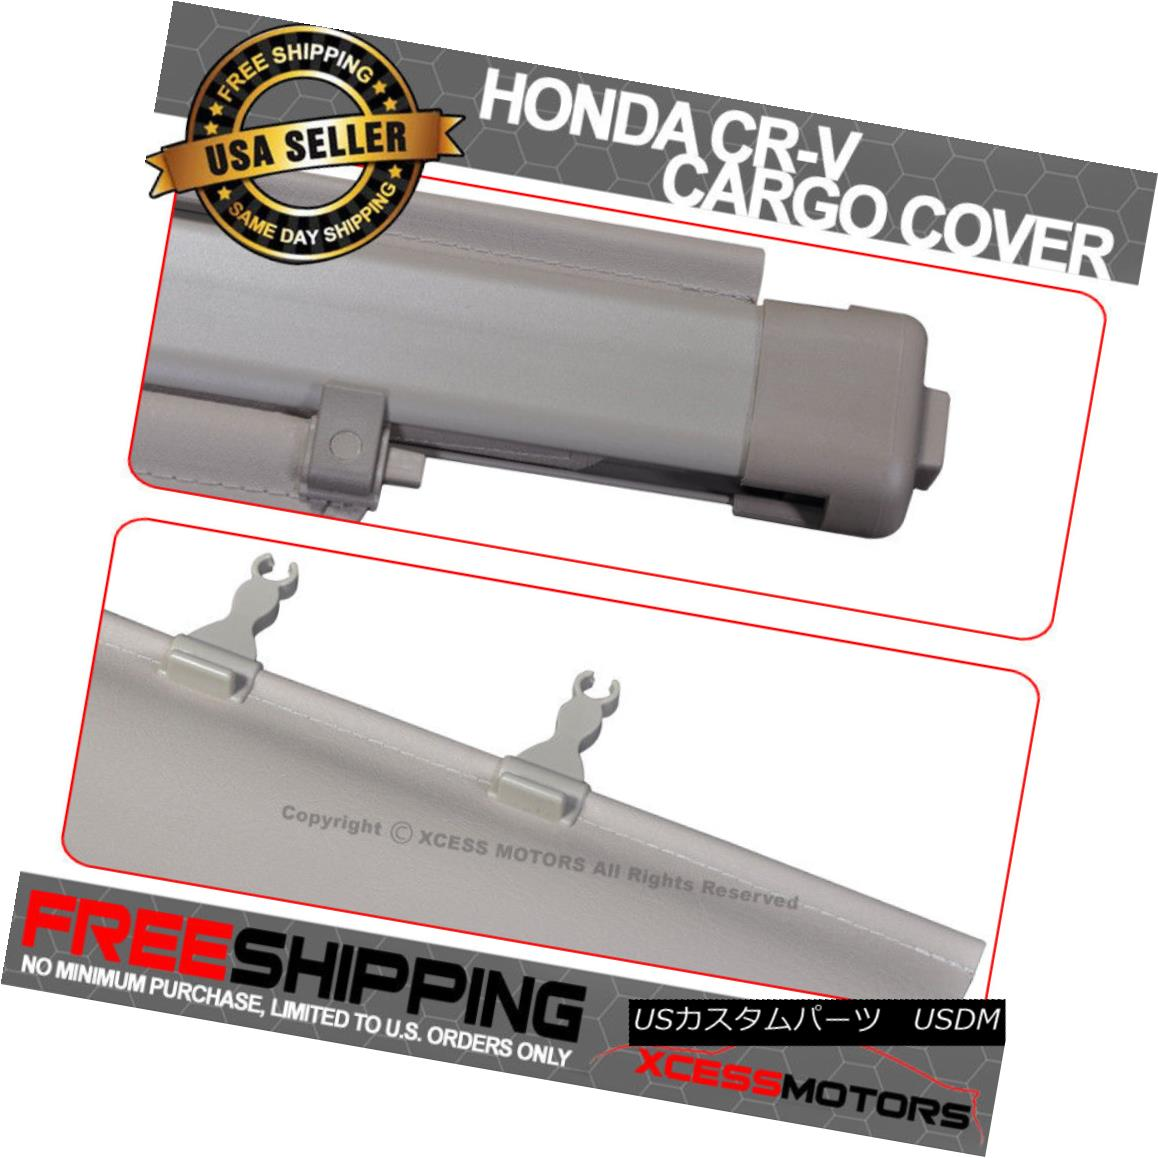 07-11 Honda CRV OE FACTORY Sty Retractable Rear Cargo Security Trunk Cover Black